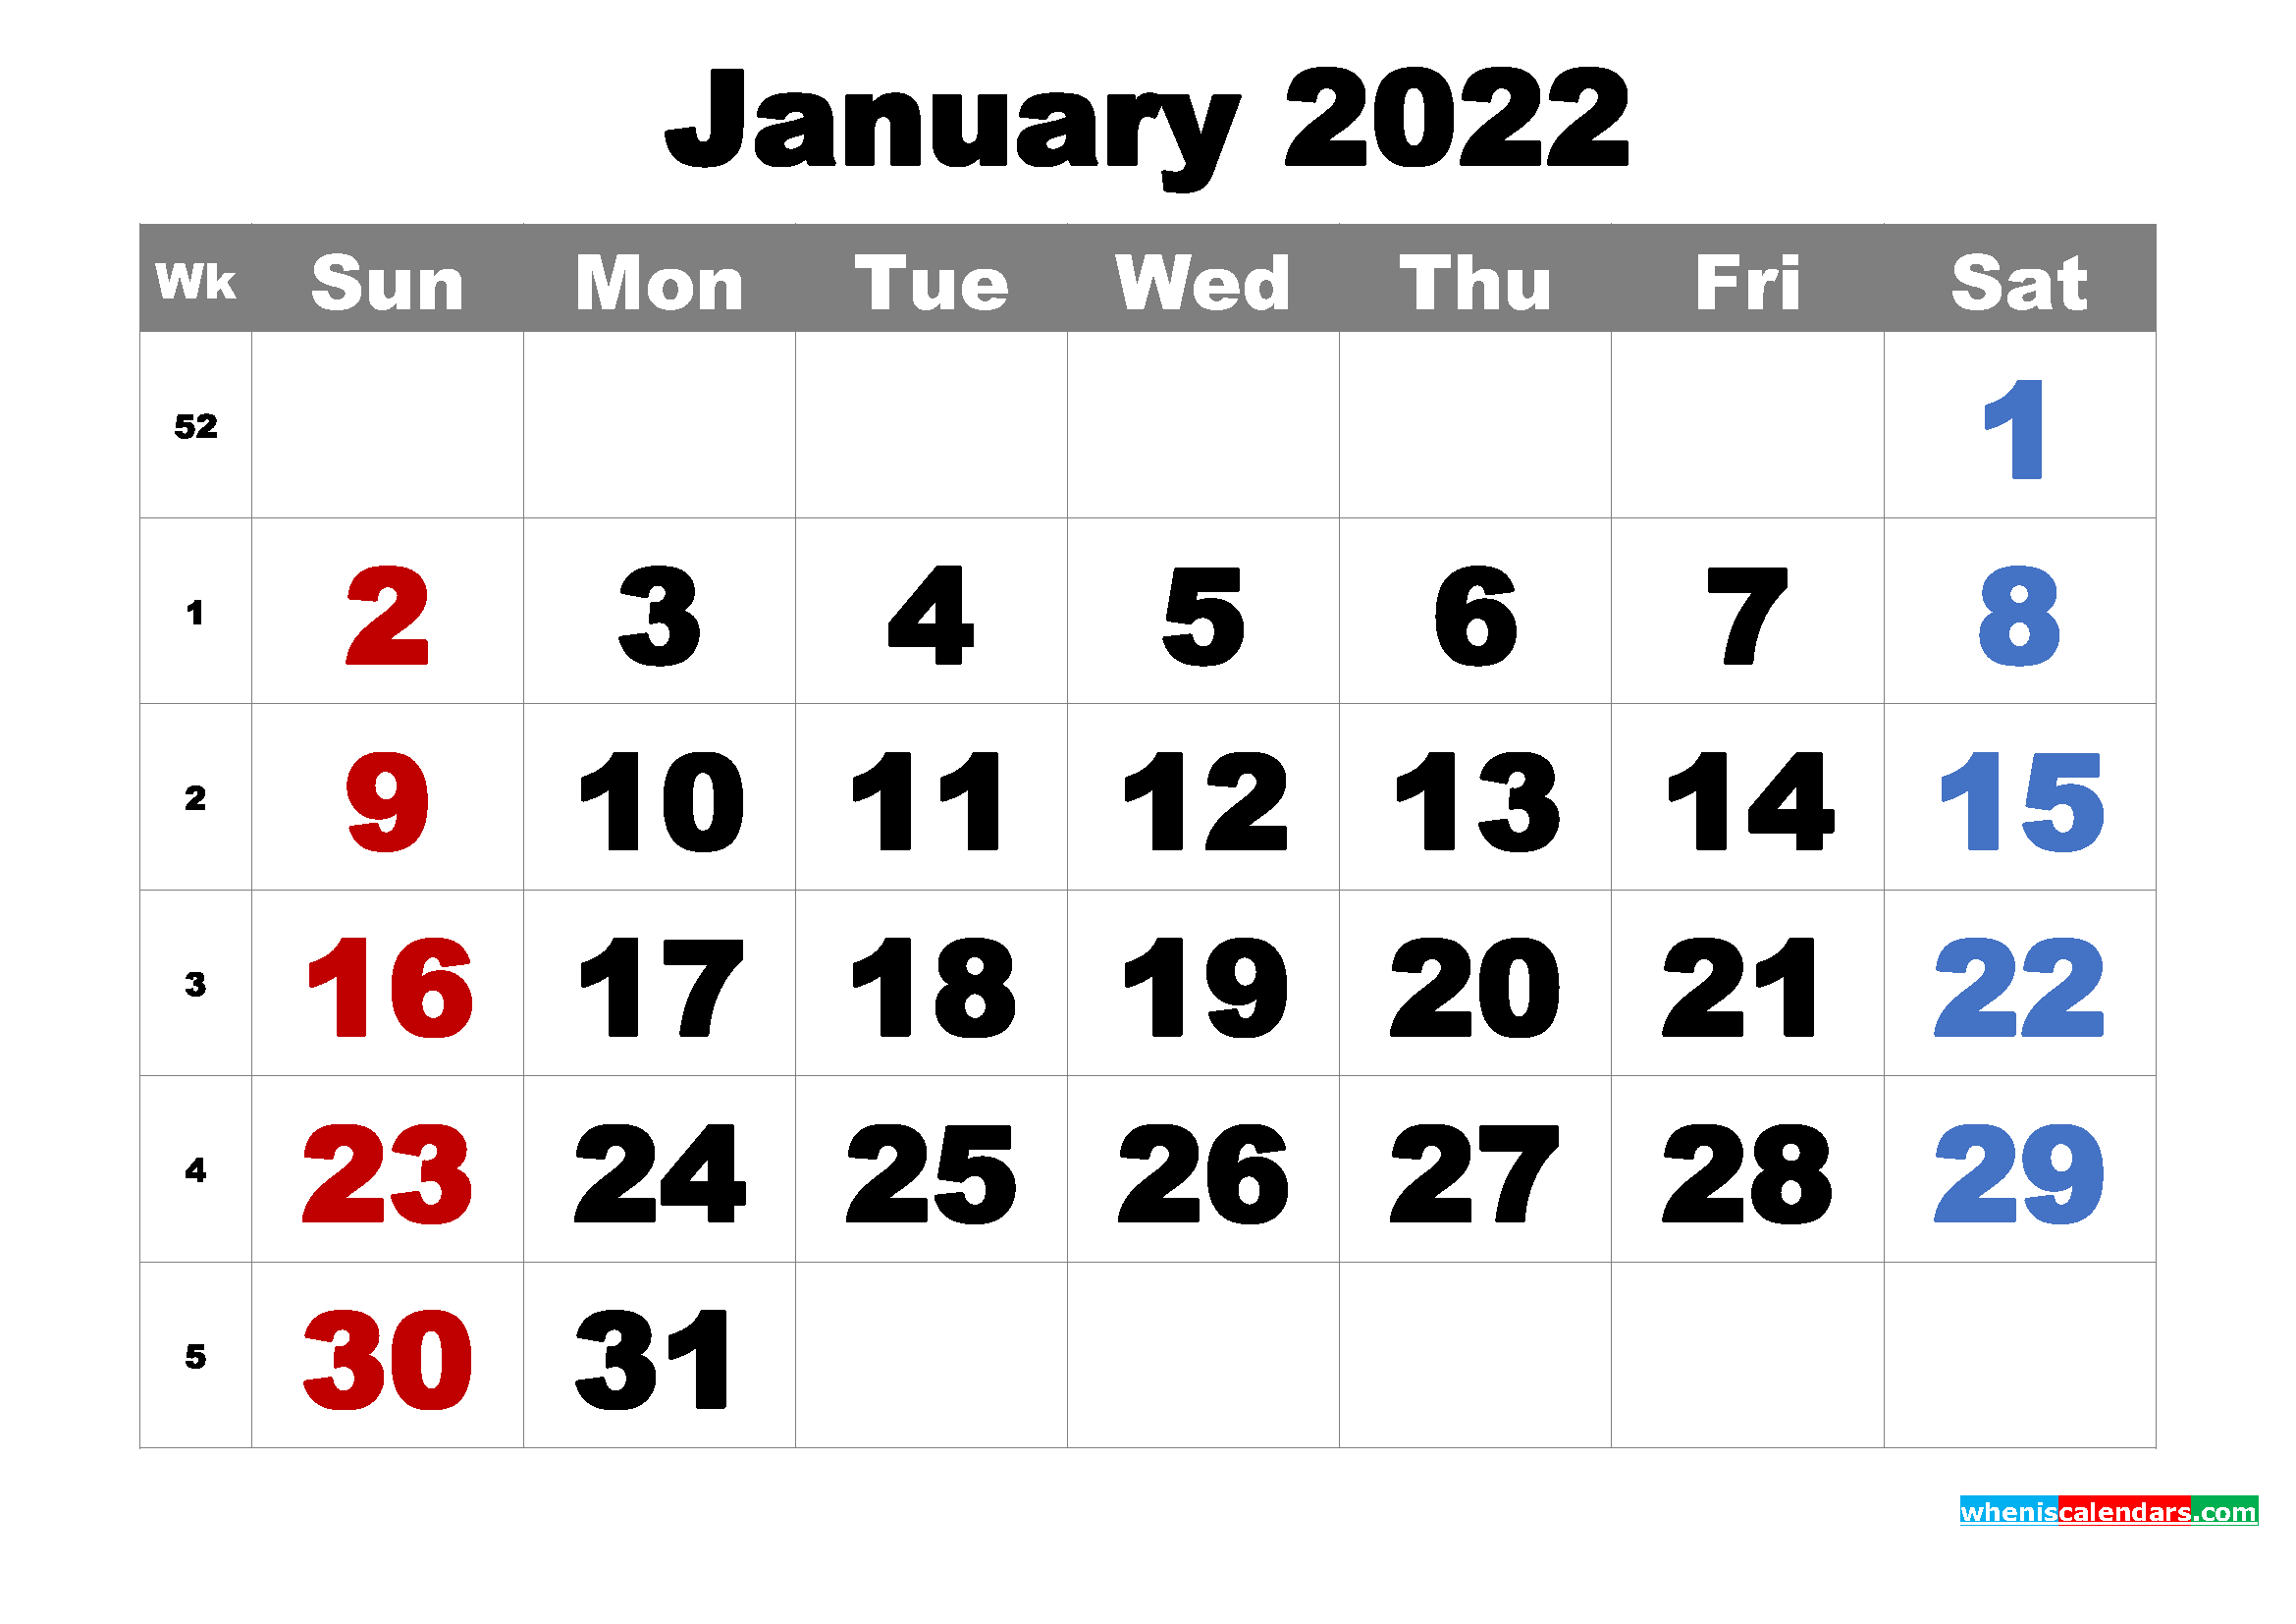 Free Printable January 2022 Calendar Word, Pdf, Image within Printable January 2022 Calendar